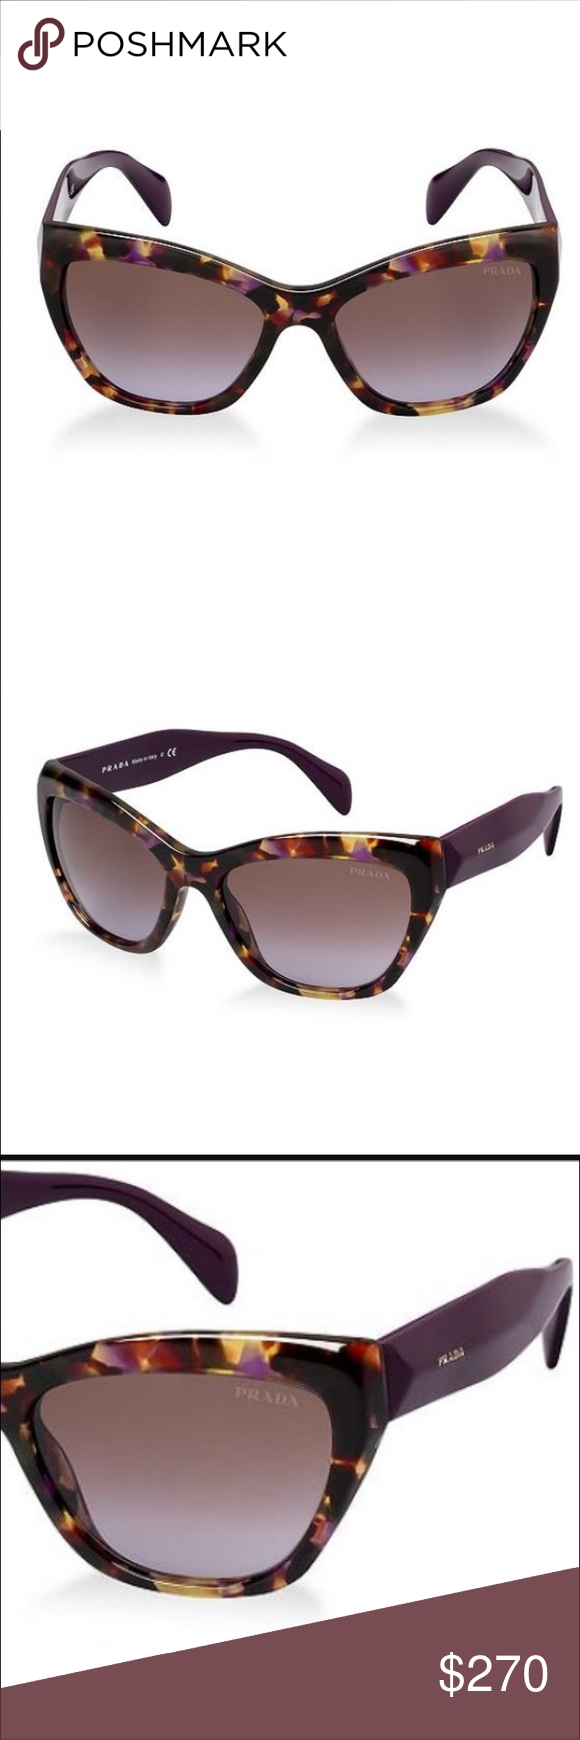 a245fd095014 Prada cat eye purple tortoise sunglasses Never worn, comes with original  case and cloth. Rare purple tortoise frames with purple arms. Prada 02QS.